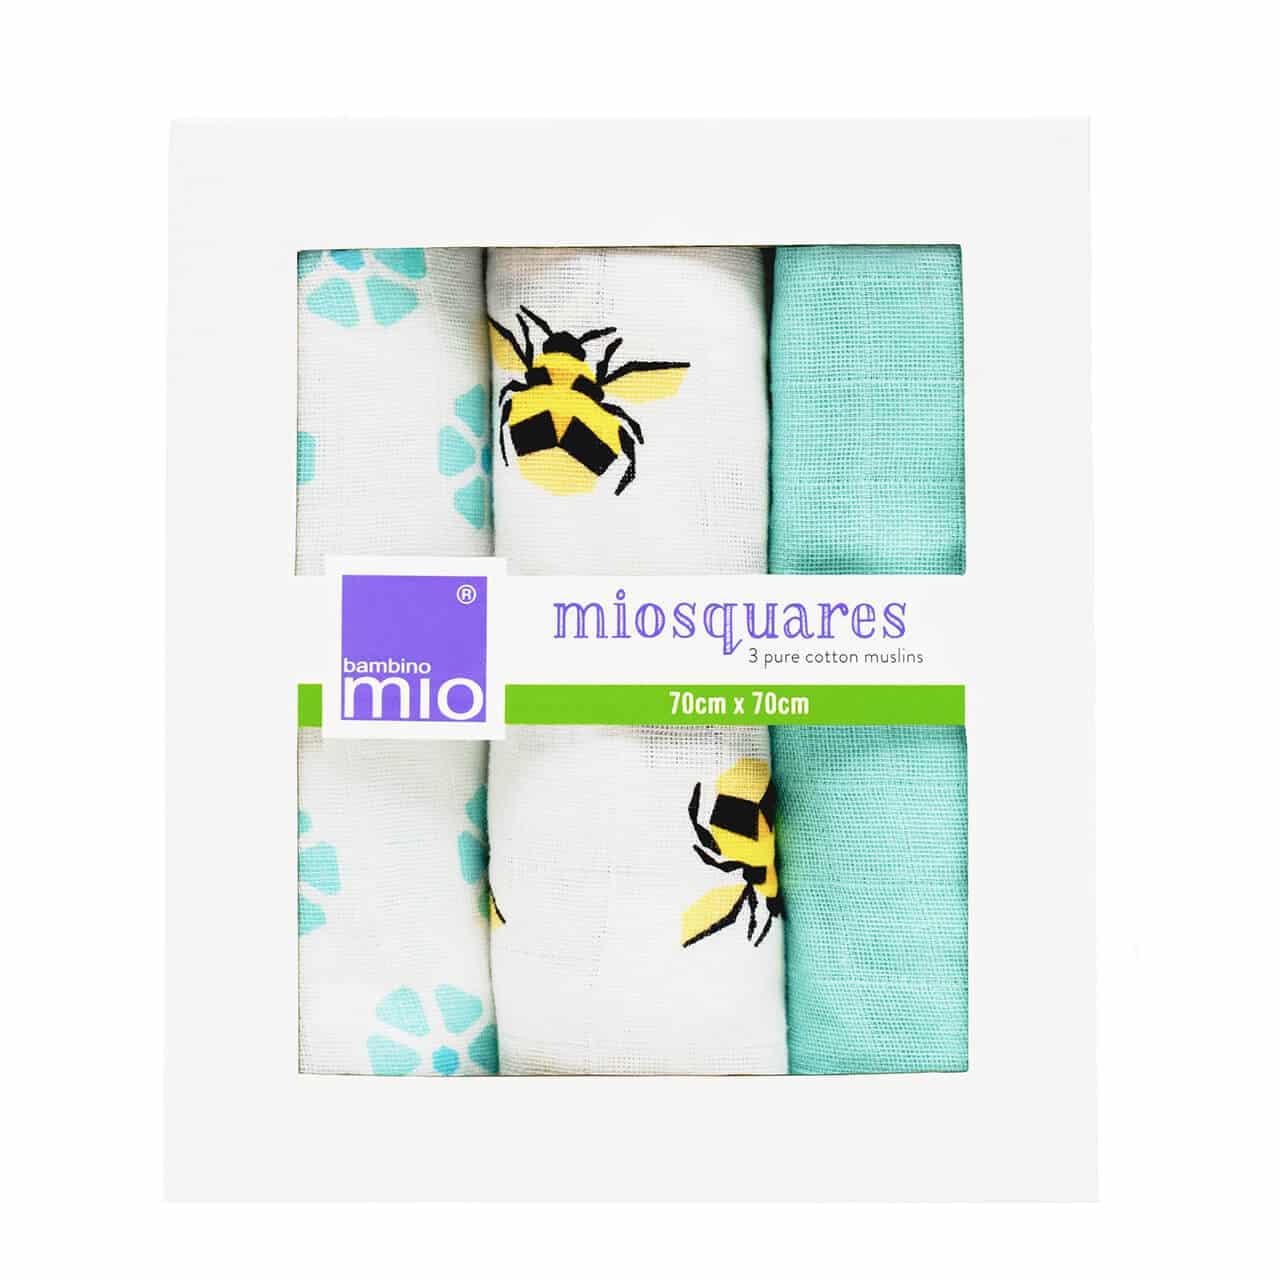 Mullwindeln Honigbiene - Bambino Mio